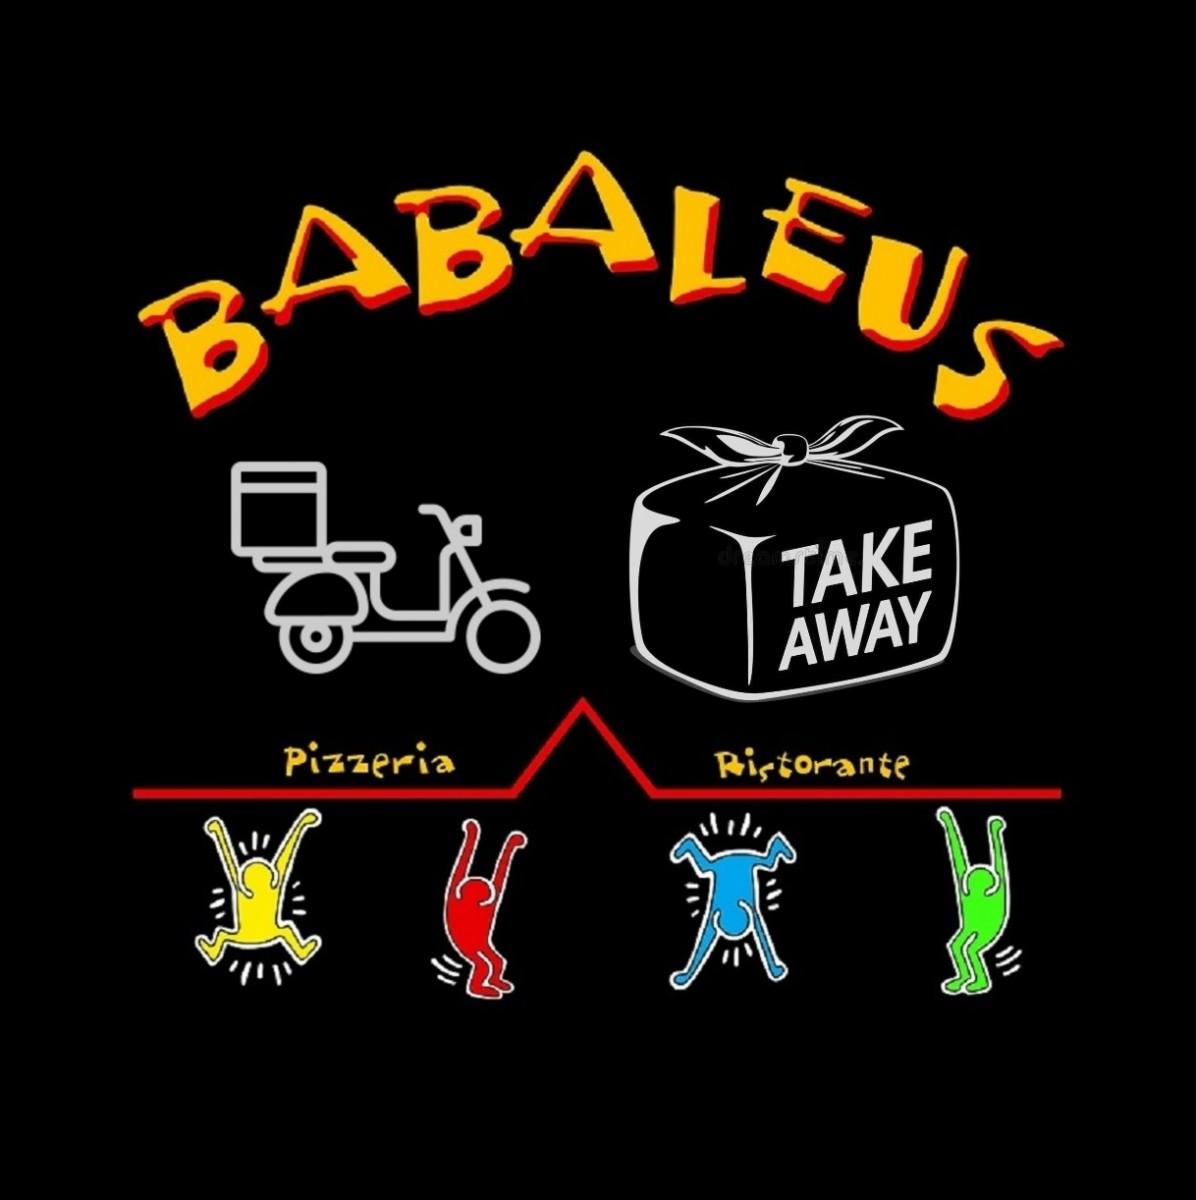 Ordinazioni online Babaleus Ravenna